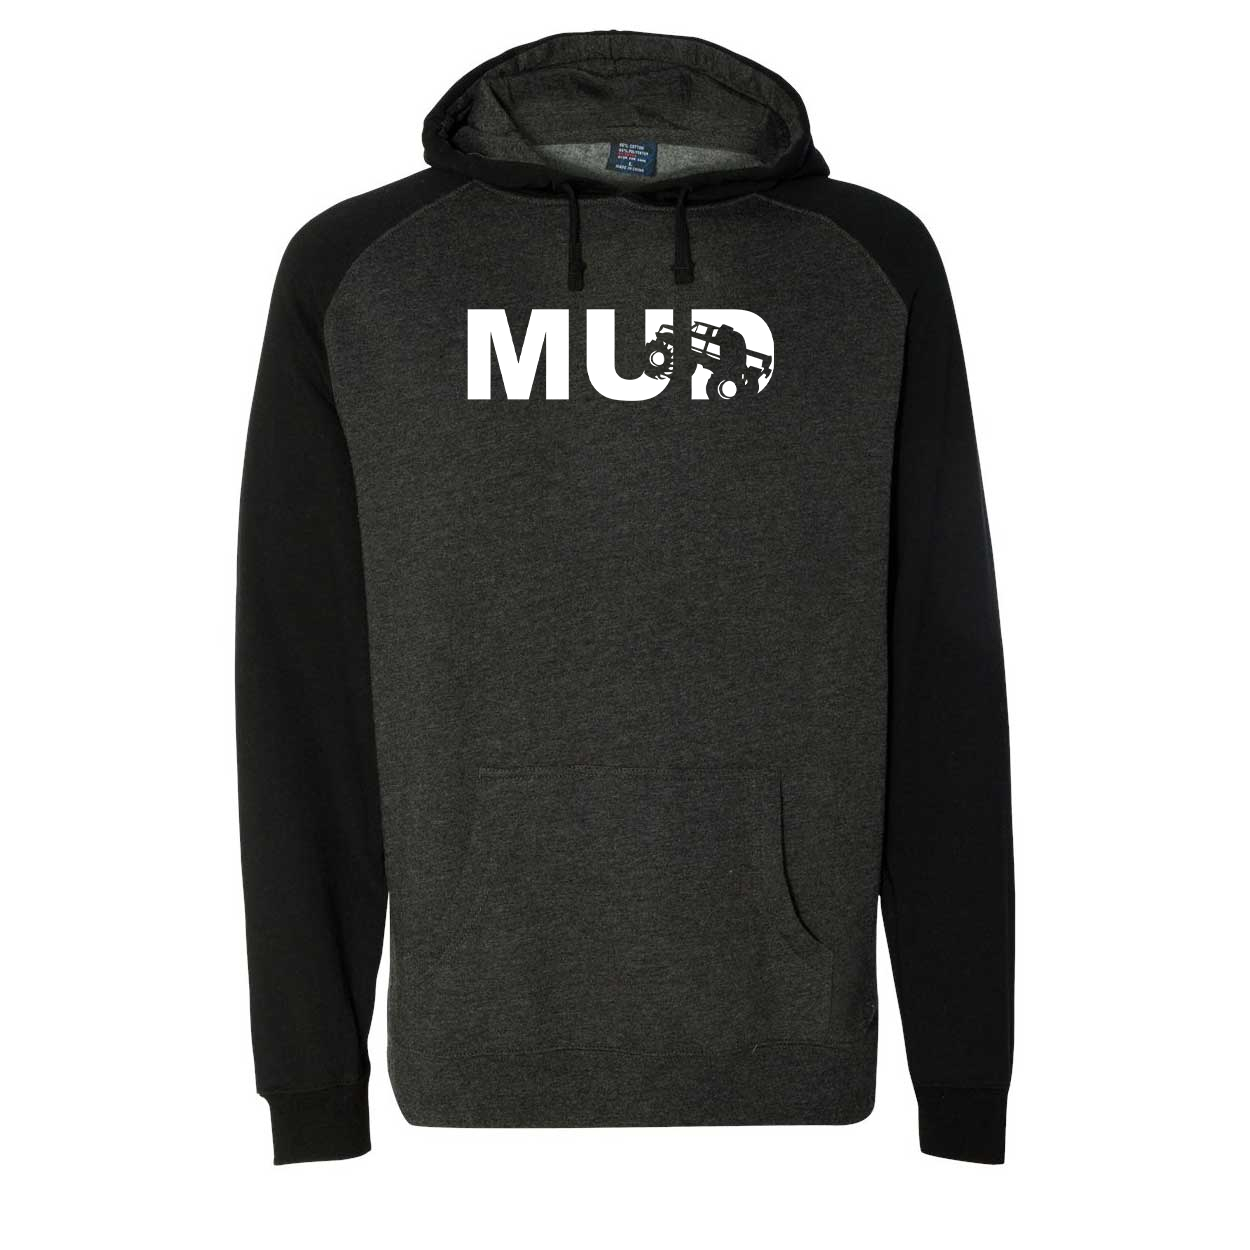 Mud Truck Logo Classic Raglan Hooded Pullover Sweatshirt Charcoal/Heather Black (White Logo)